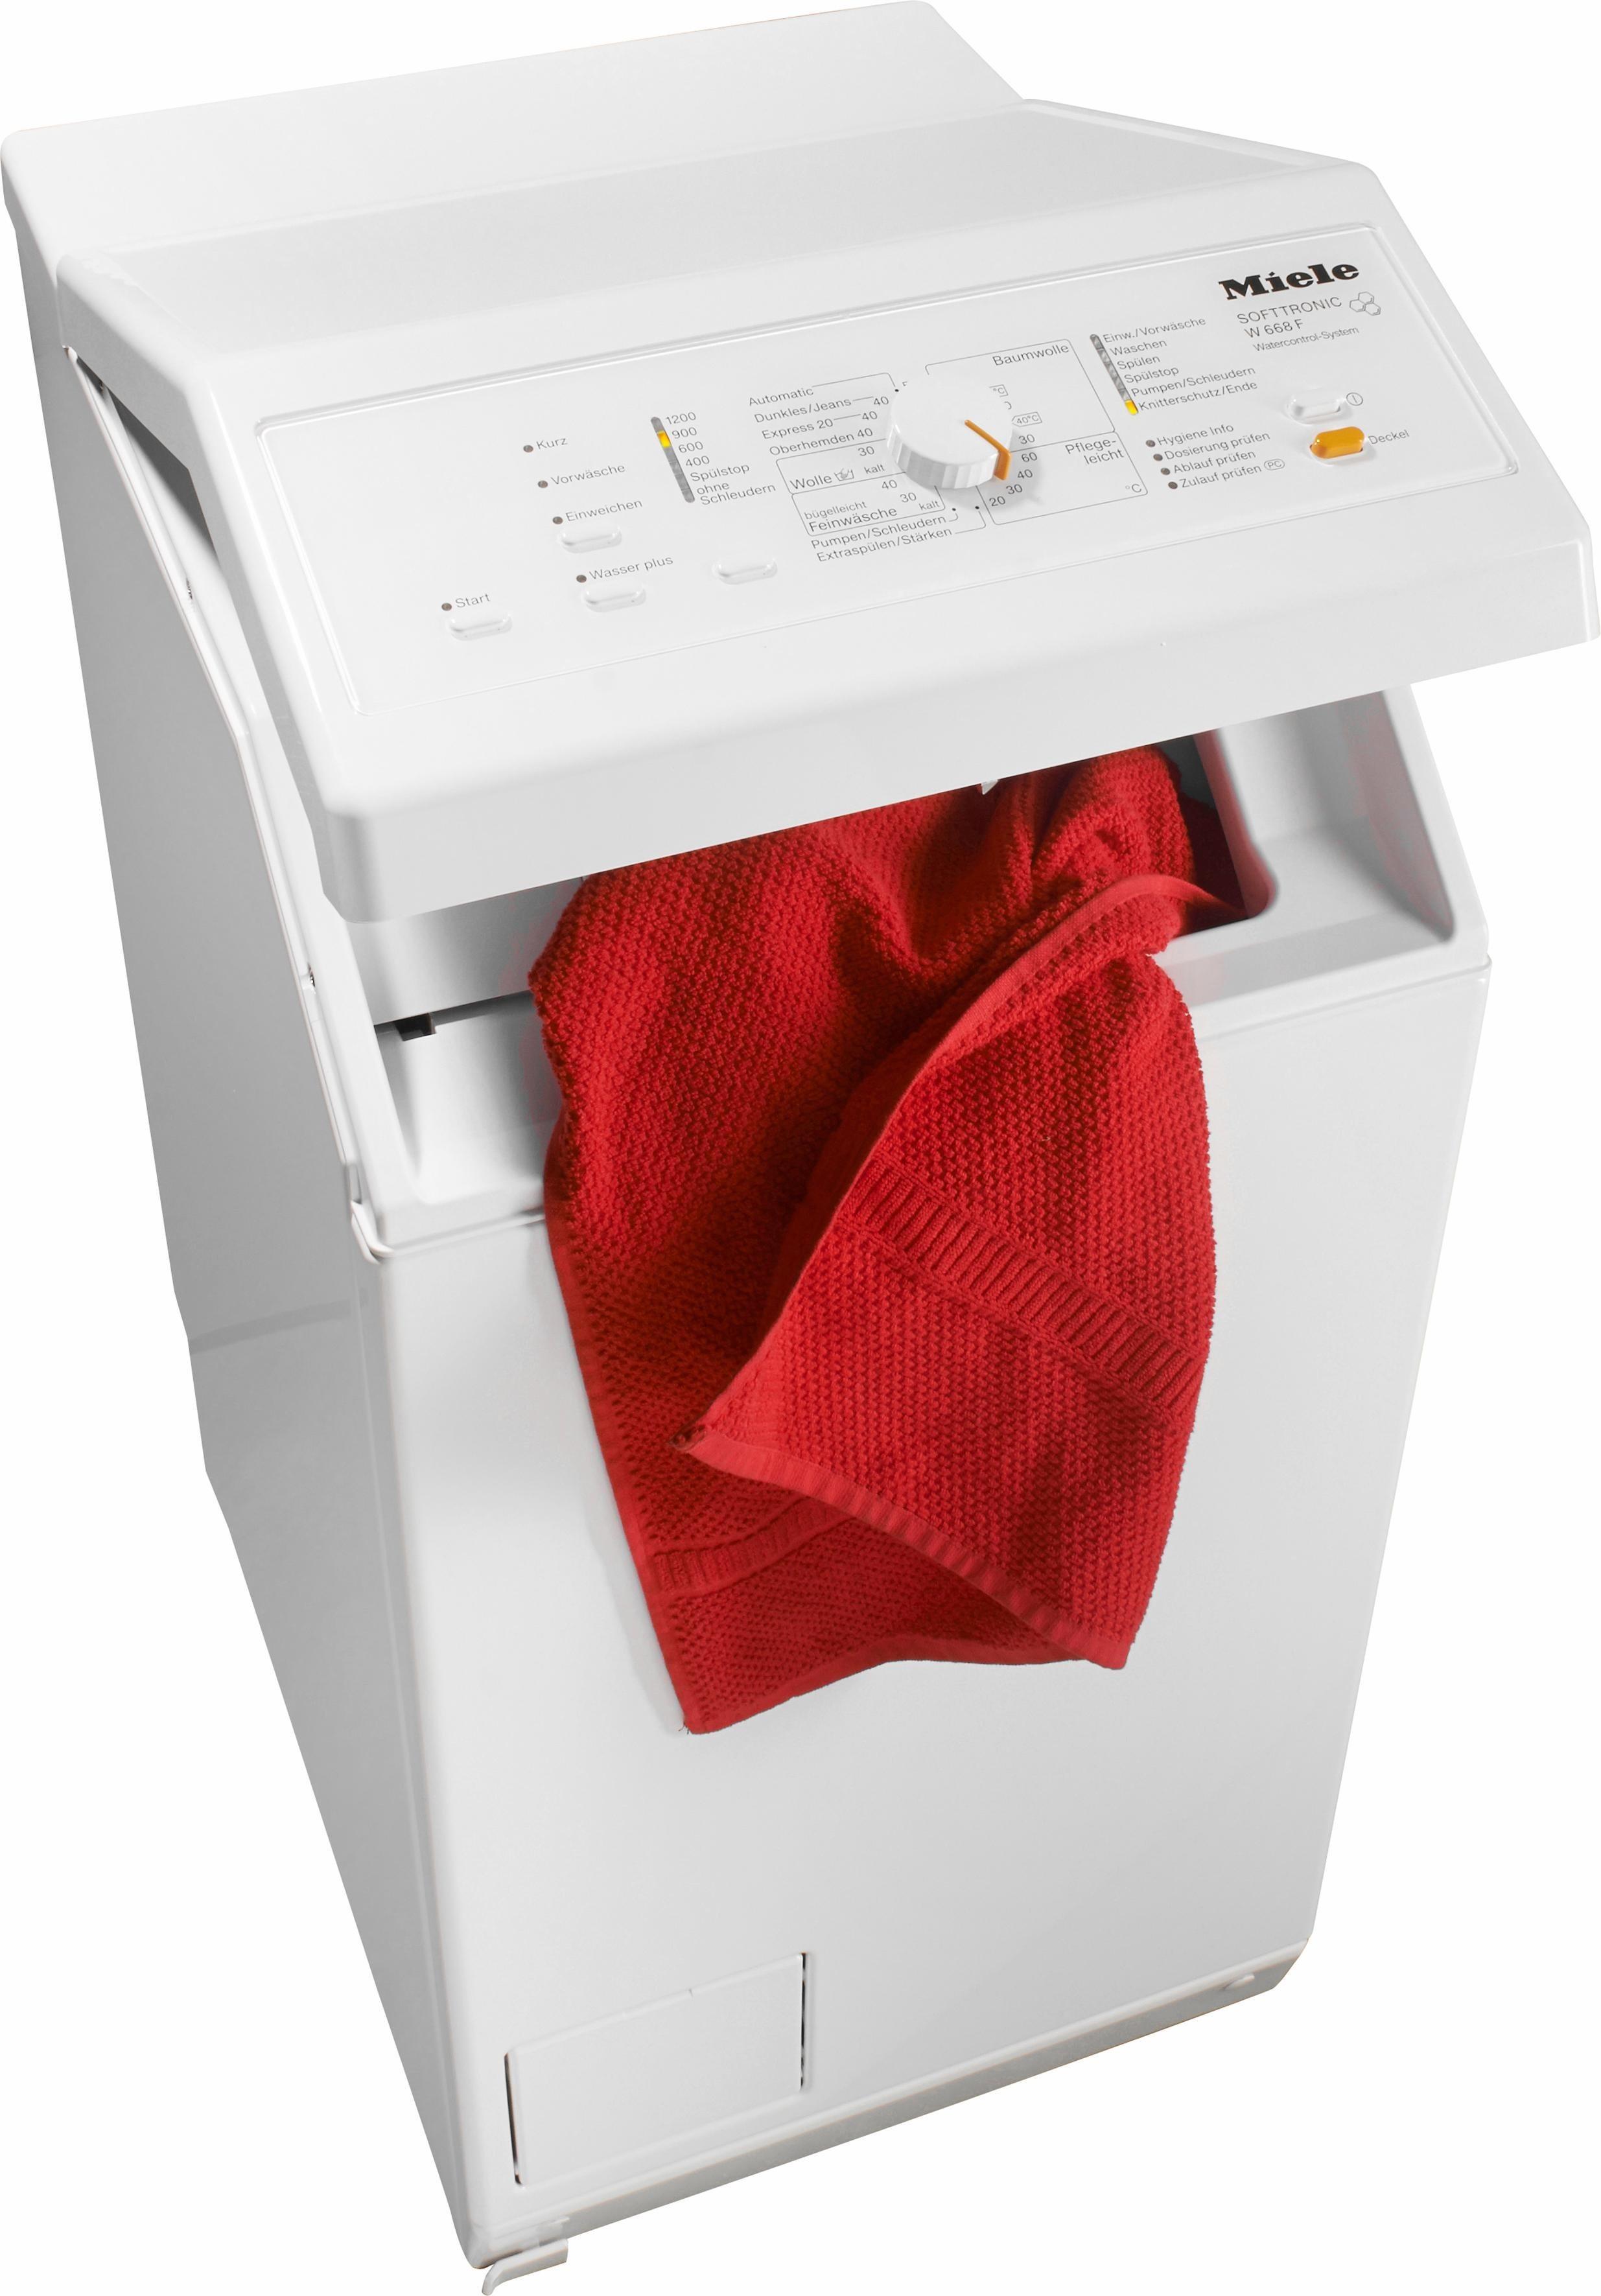 Waschmaschine Toplader W 668 F WCS, 6 kg, 1200 U/Min